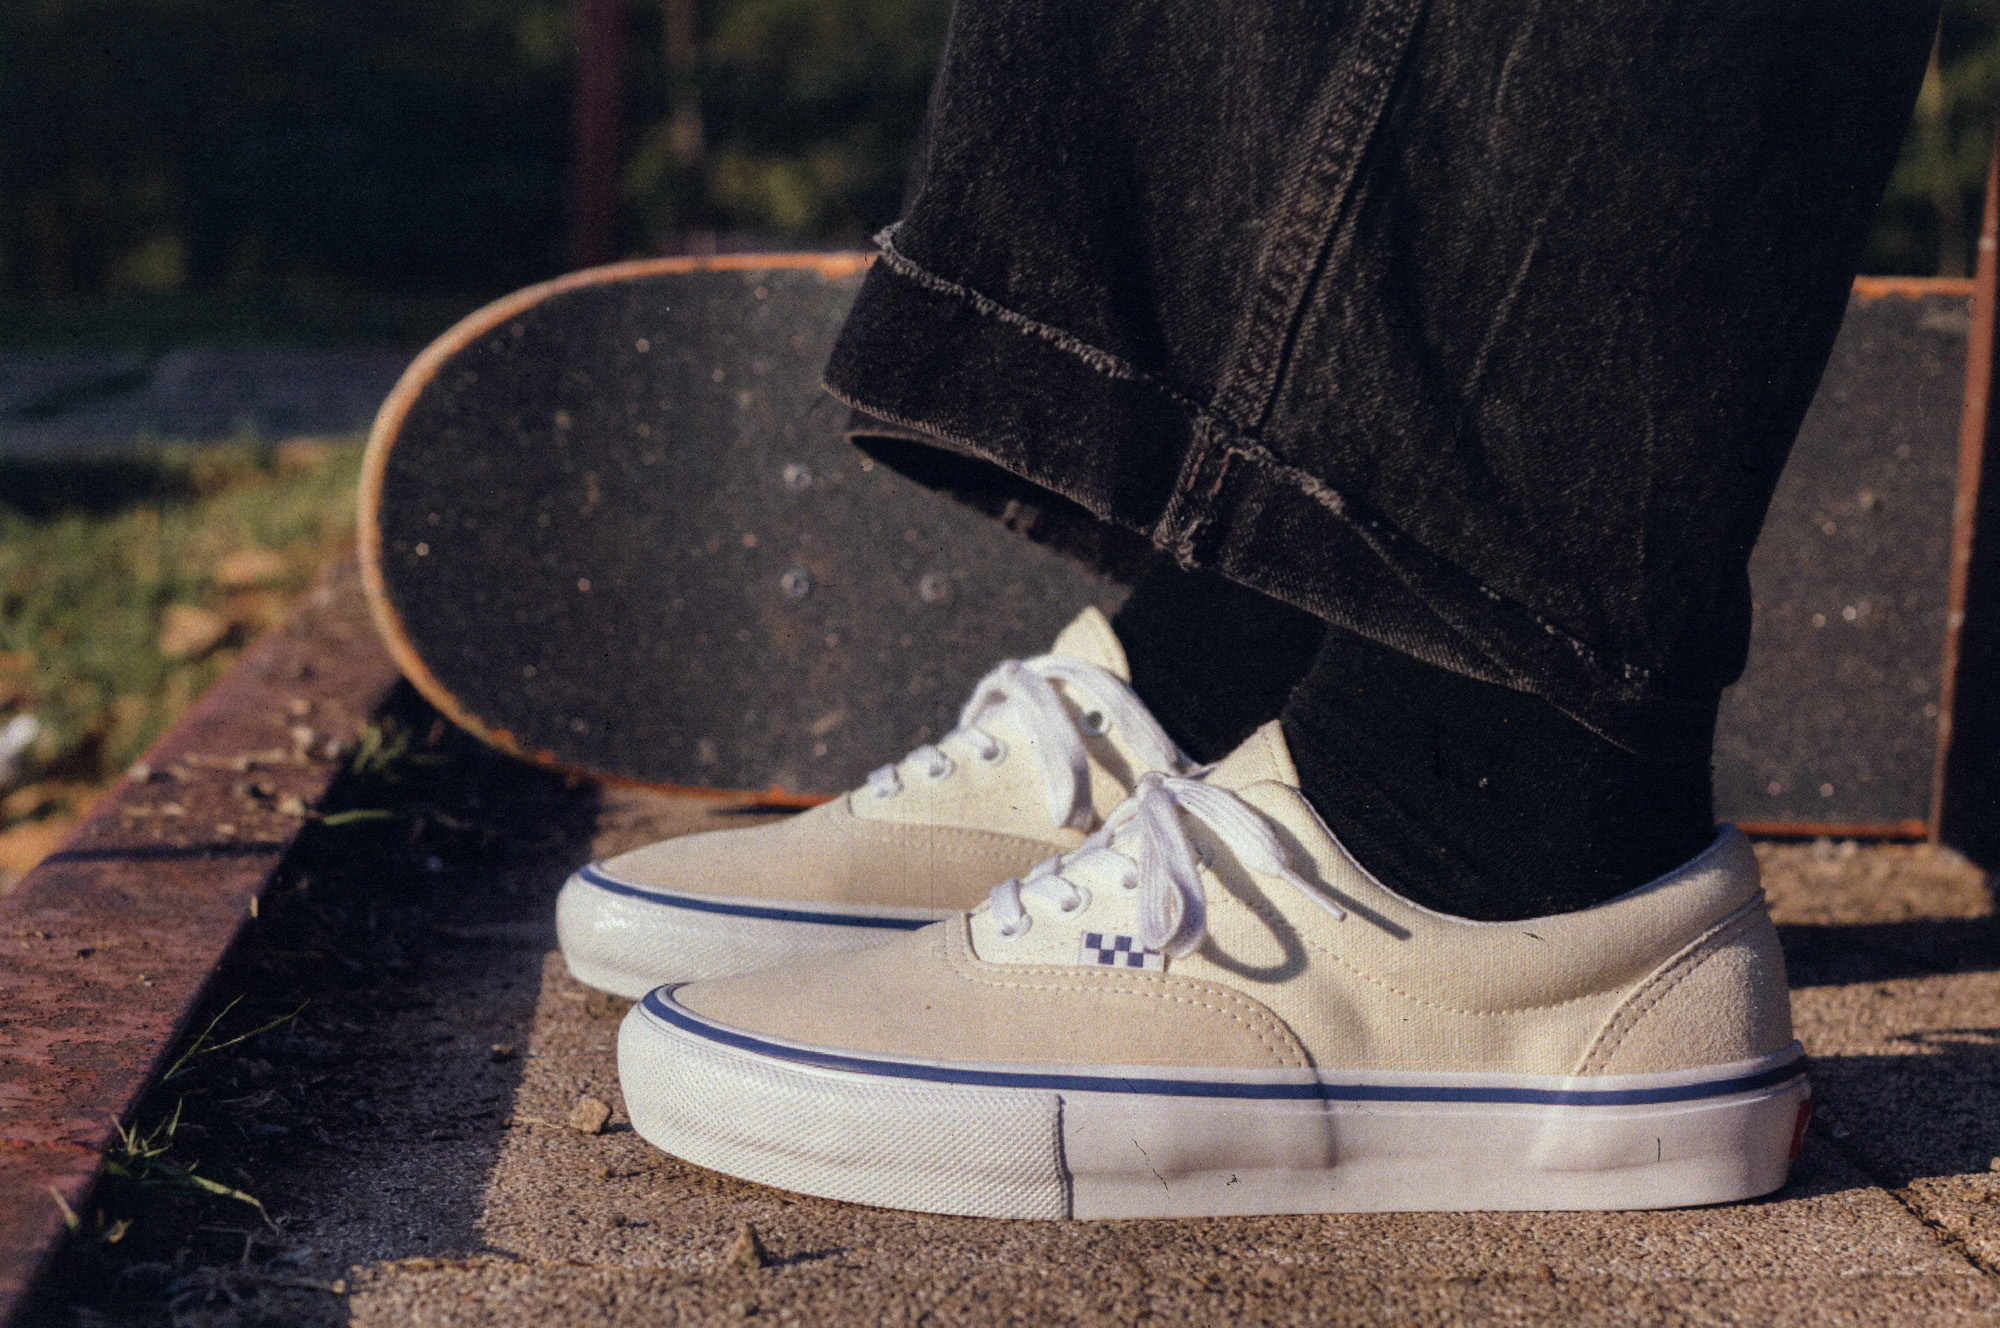 Vans Introduces All-New Skate Classics: Built For Skateboarding